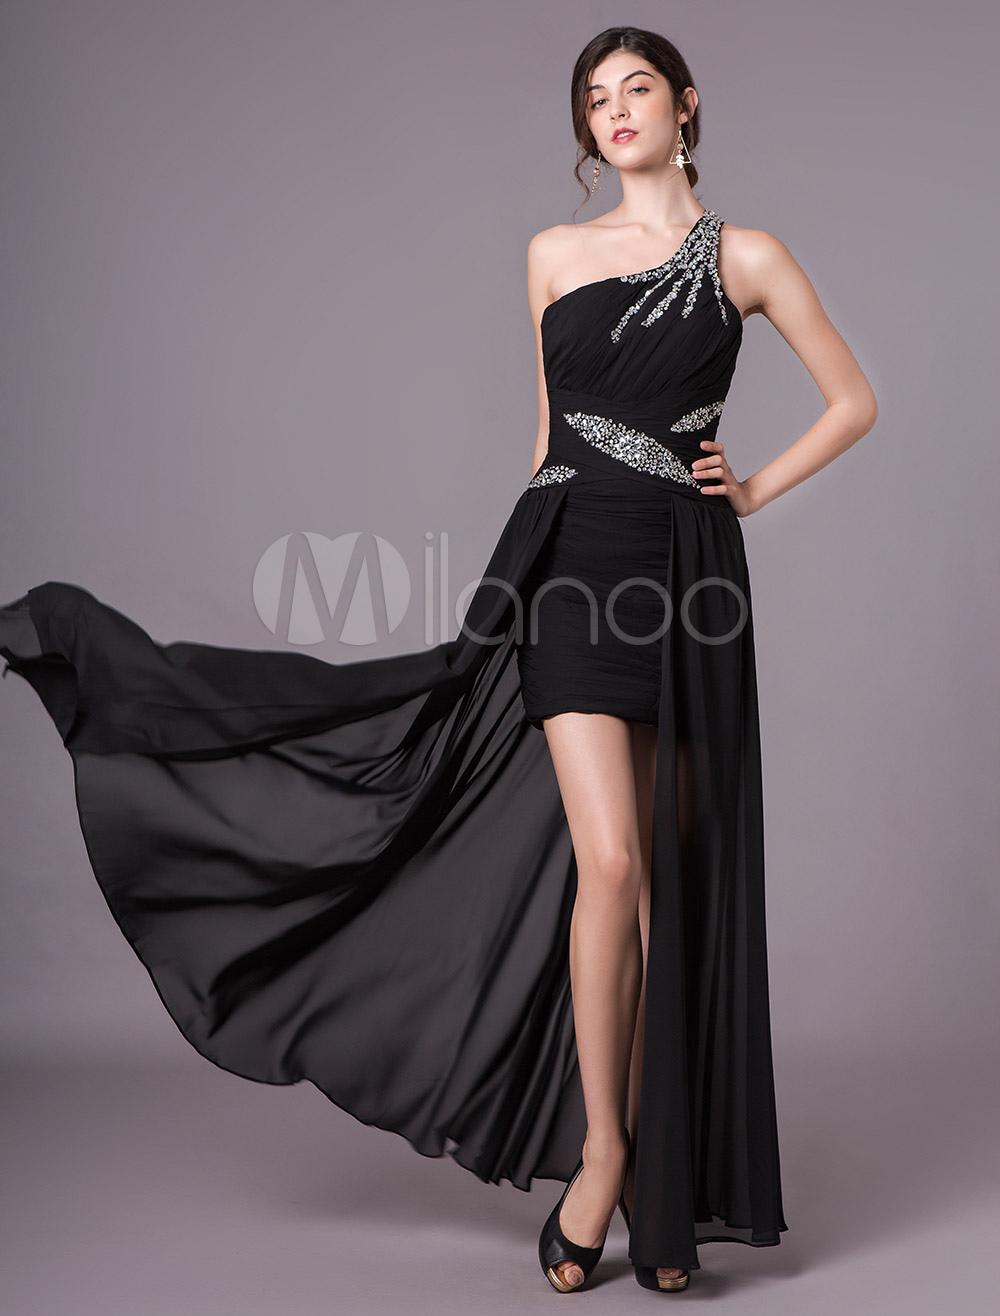 559a11909eb58 Black Prom Dresses One Shoulder Chiffon High Low Beading Long Formal  Evening Dress